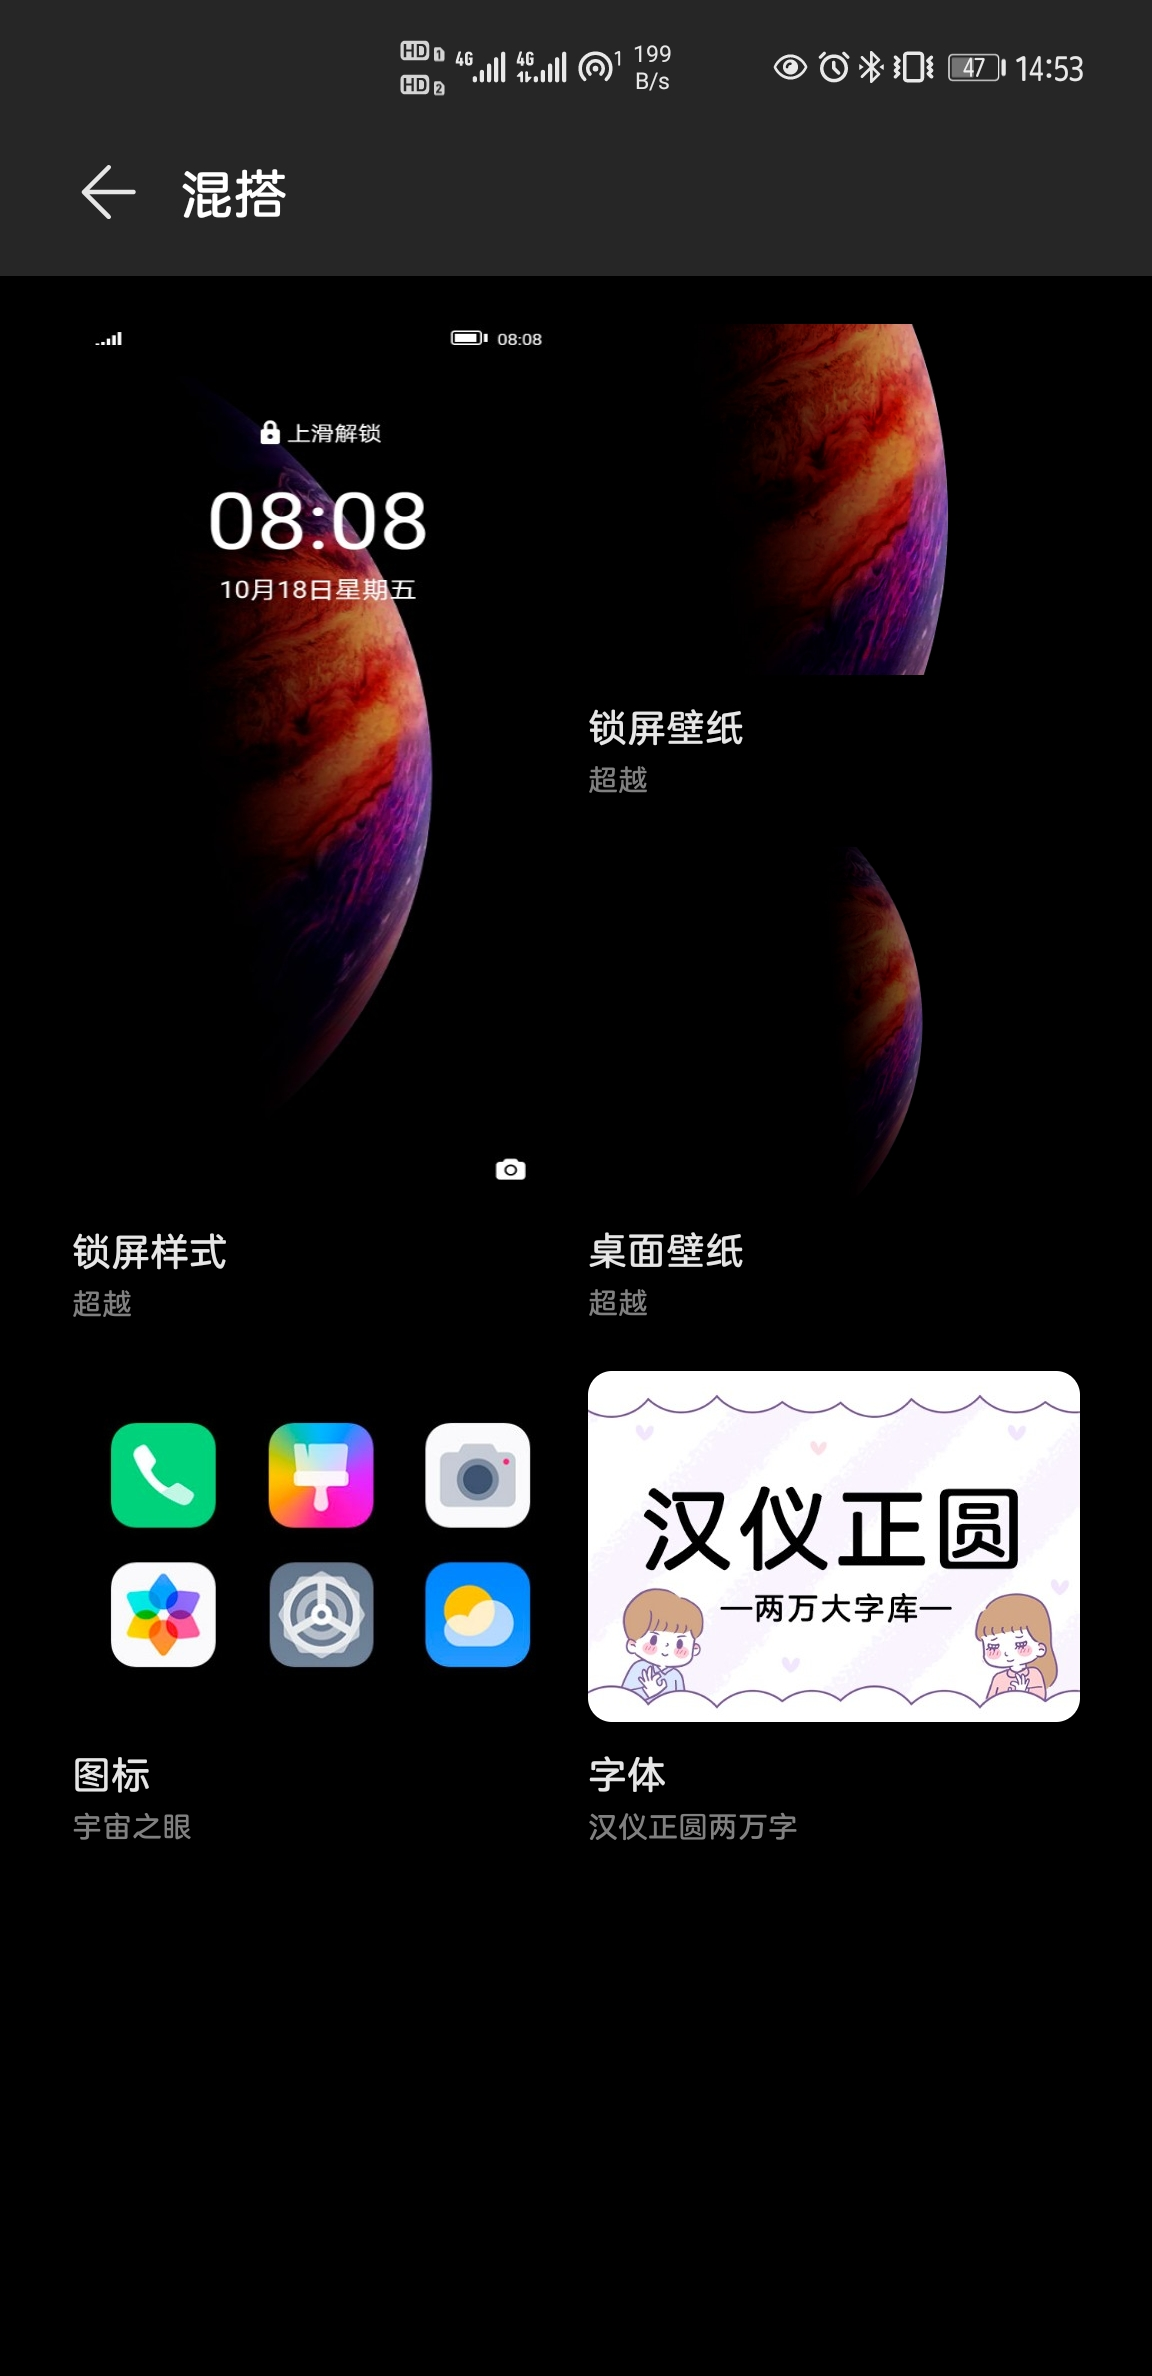 Screenshot_20210315_145322_com.huawei.android.thememanager.jpg